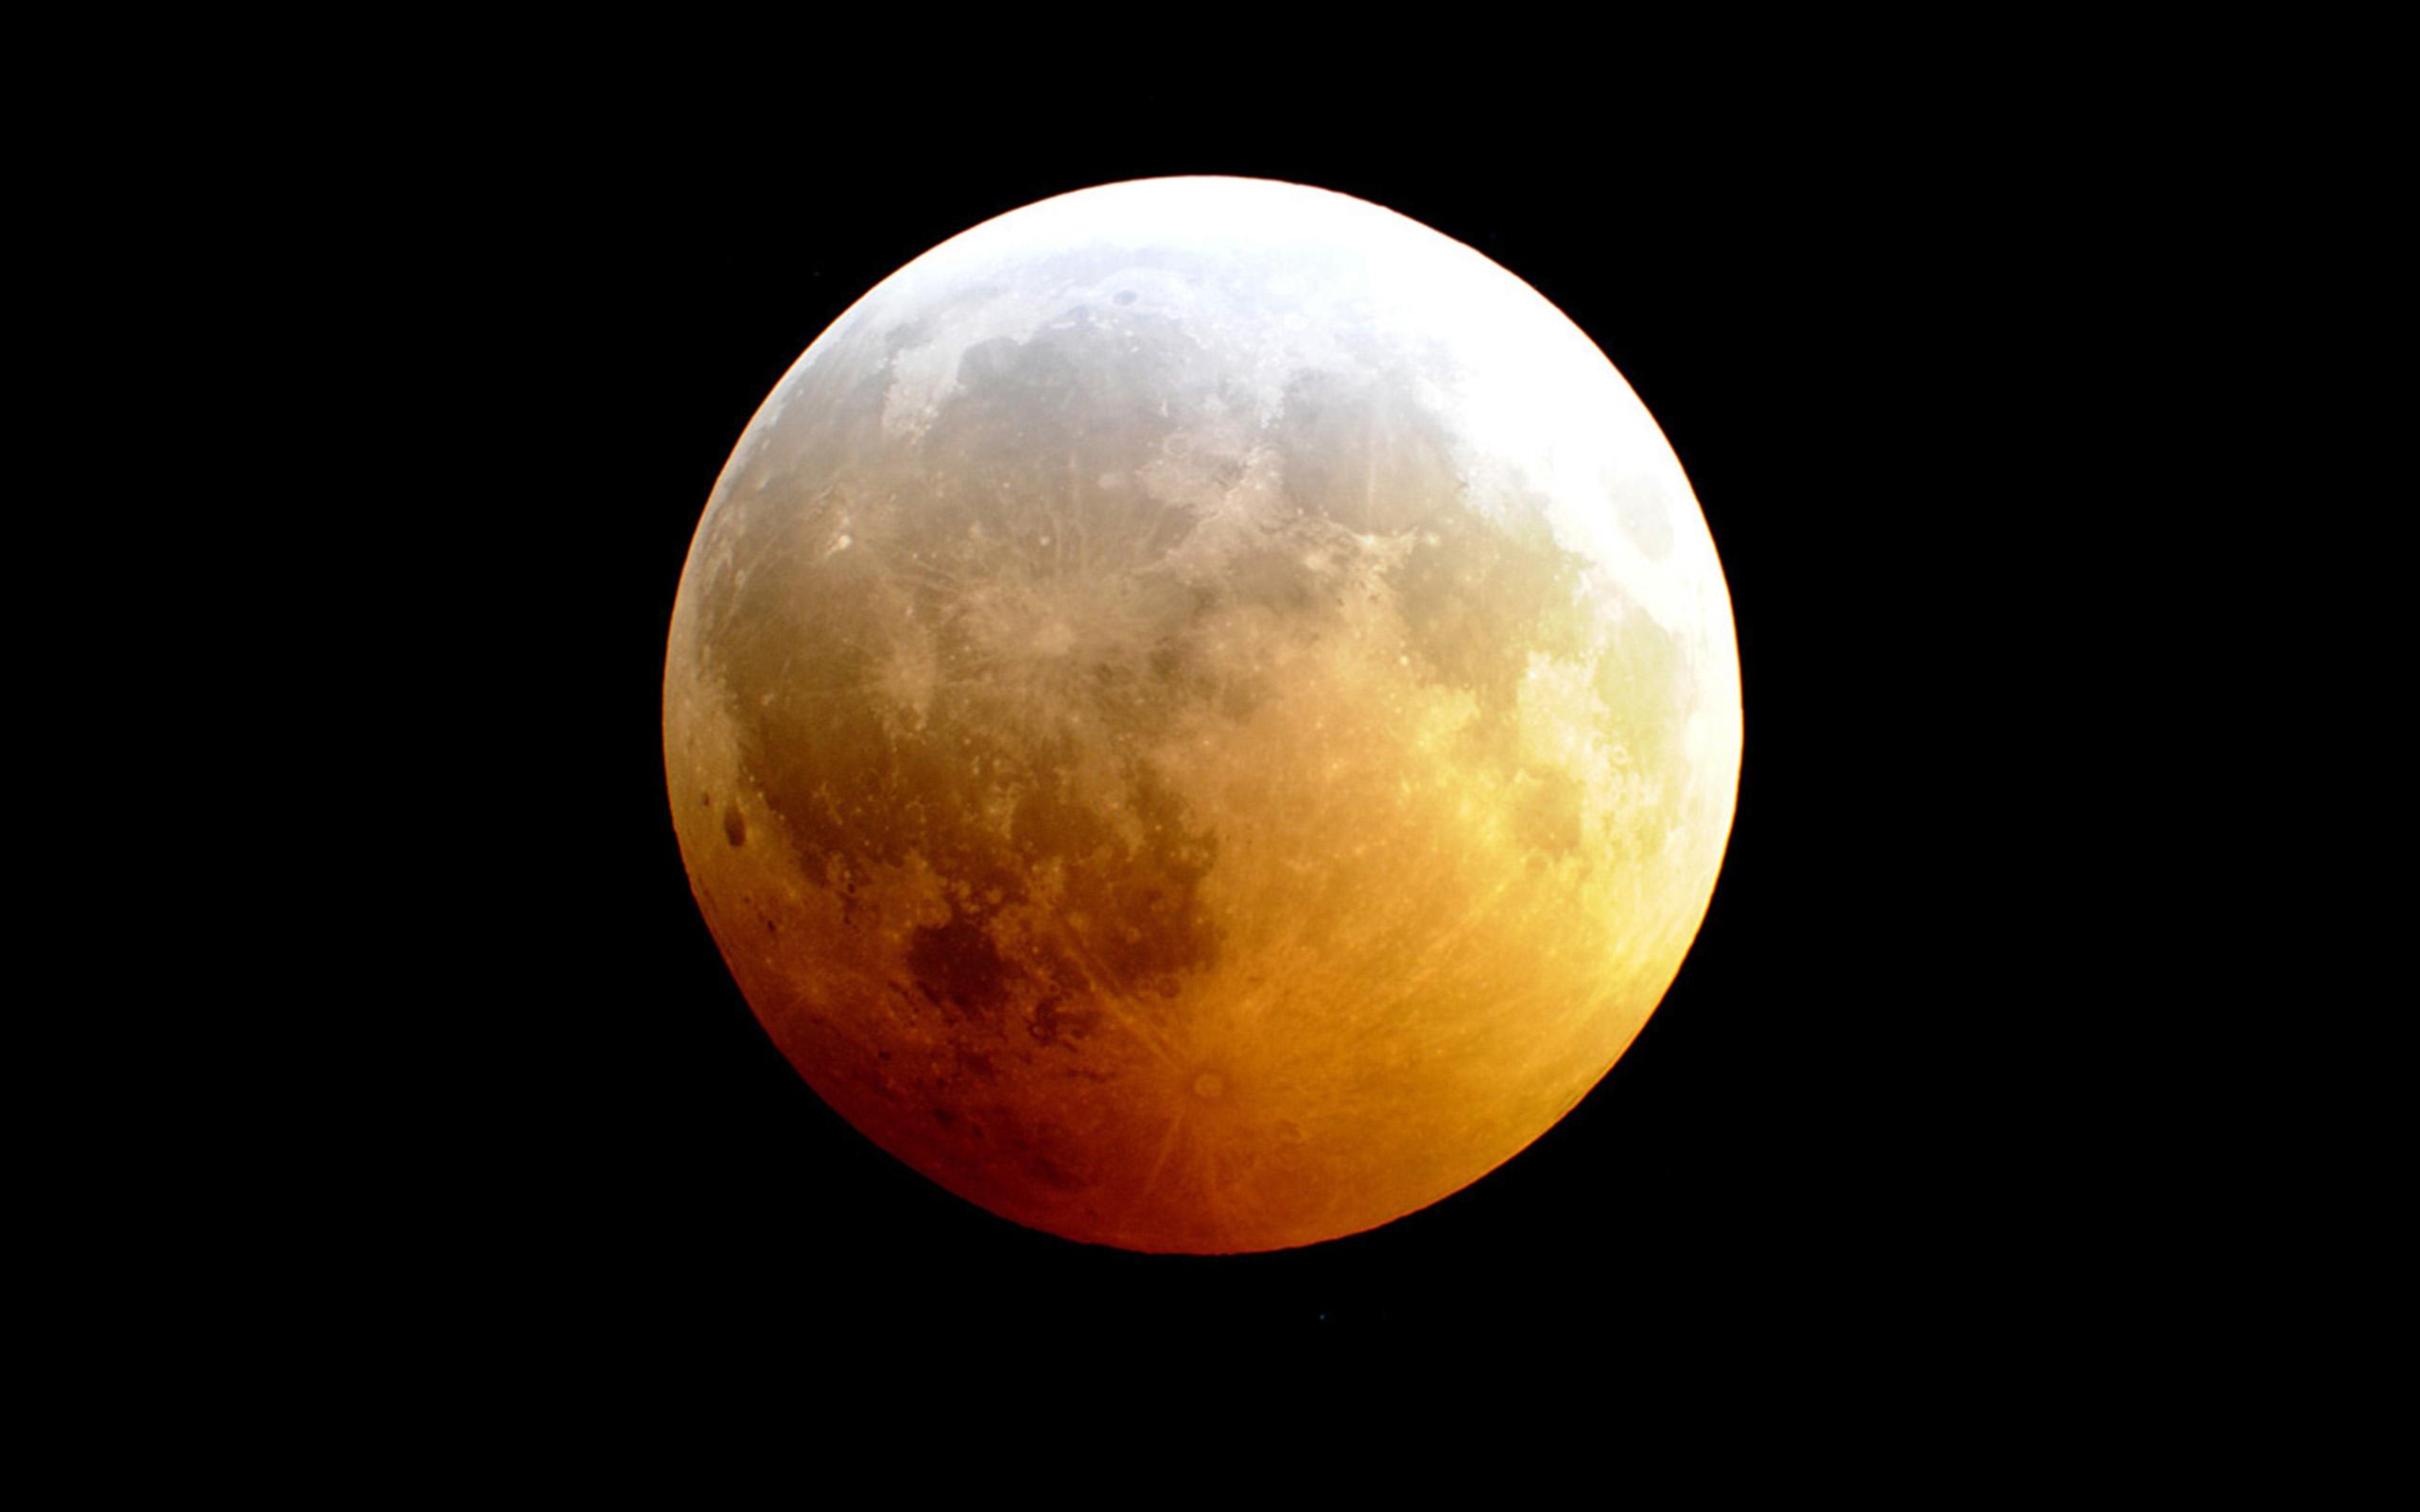 Lune Fond d'écran HD | Arrière-Plan | 2560x1600 | ID:431666 - Wallpaper Abyss